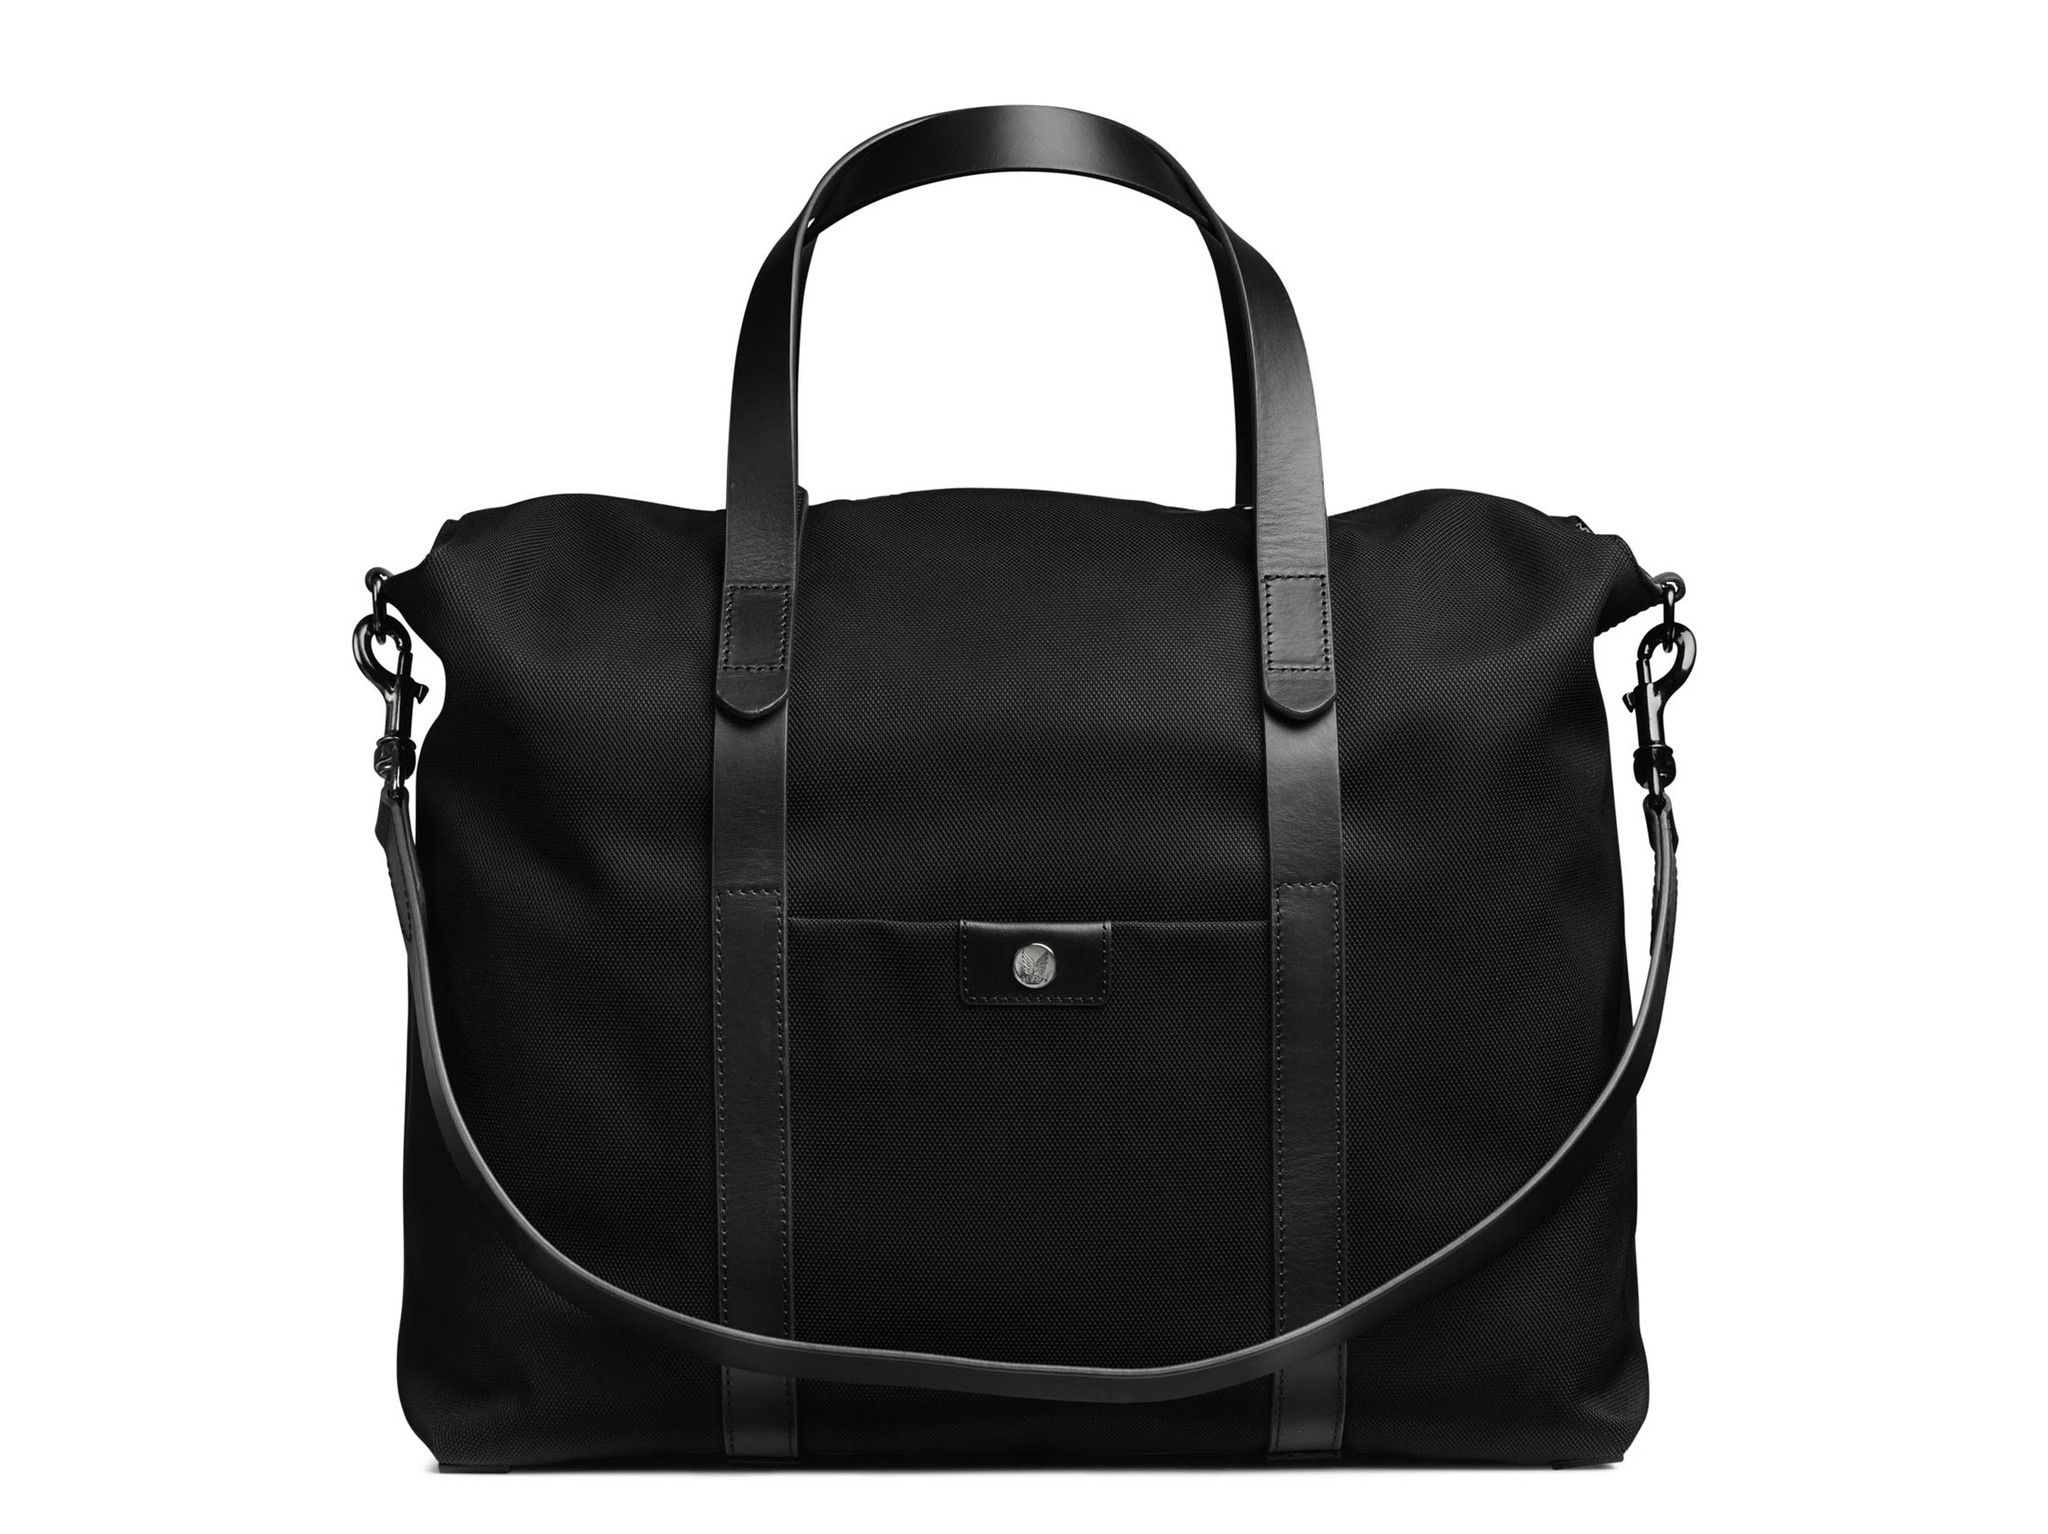 M/S Beach Tote - Black/Black - Tote bag - Mismo - 1   MISMO Bags ...